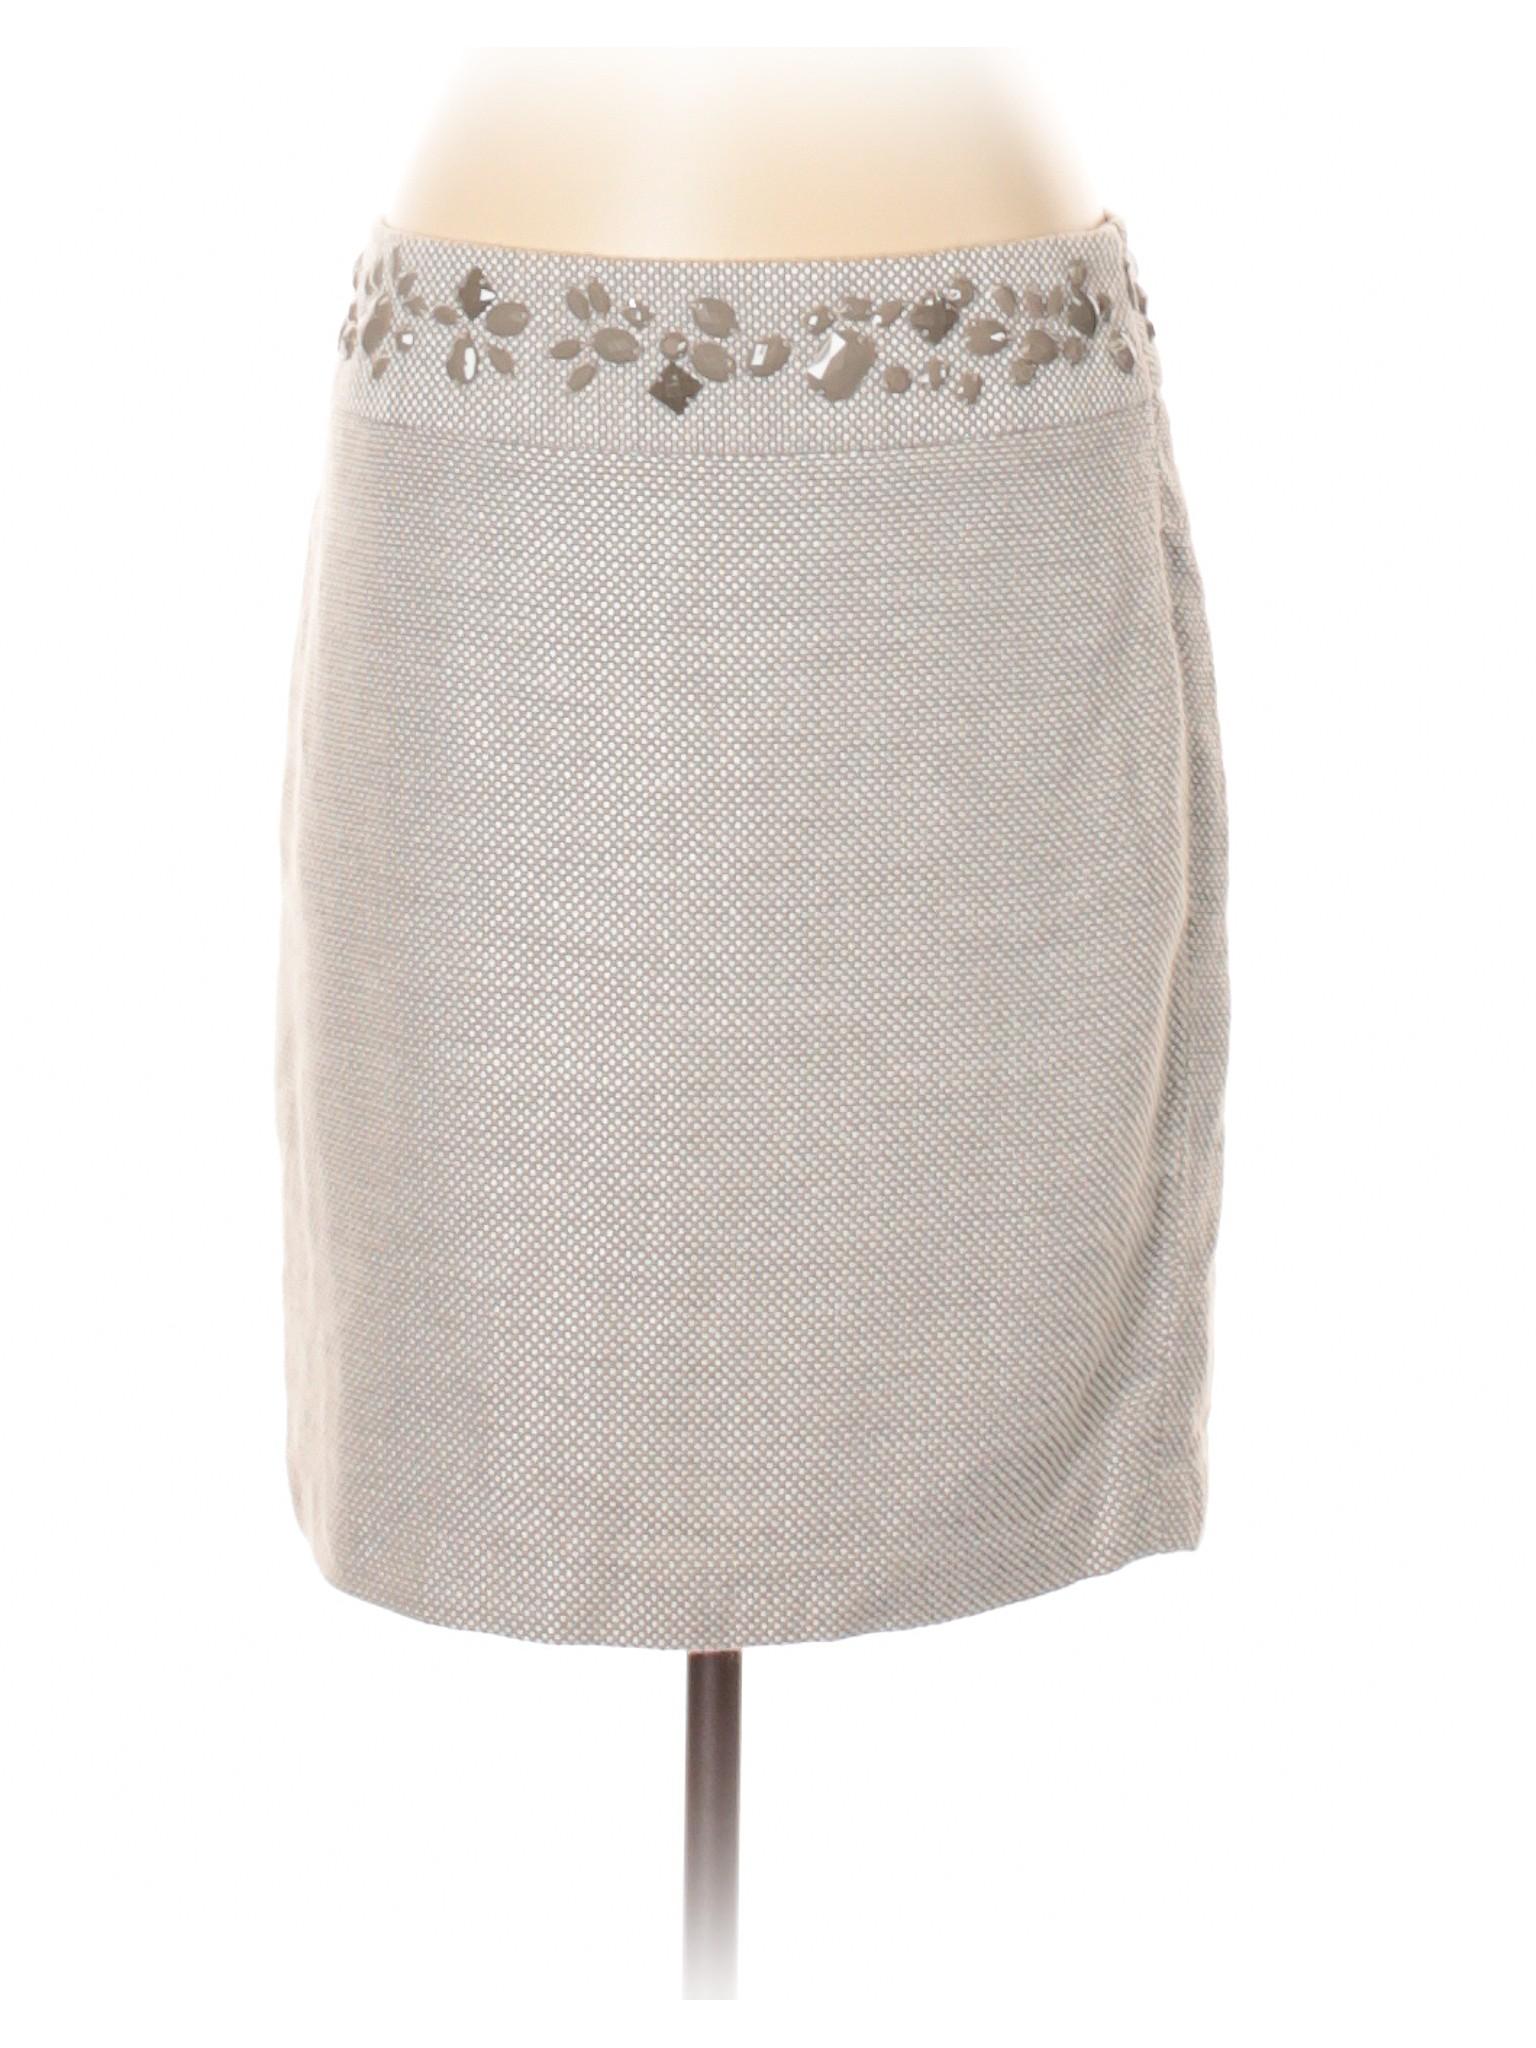 Casual Skirt Casual Boutique Casual Boutique Skirt Boutique Casual Skirt Boutique g7Ew5qf45